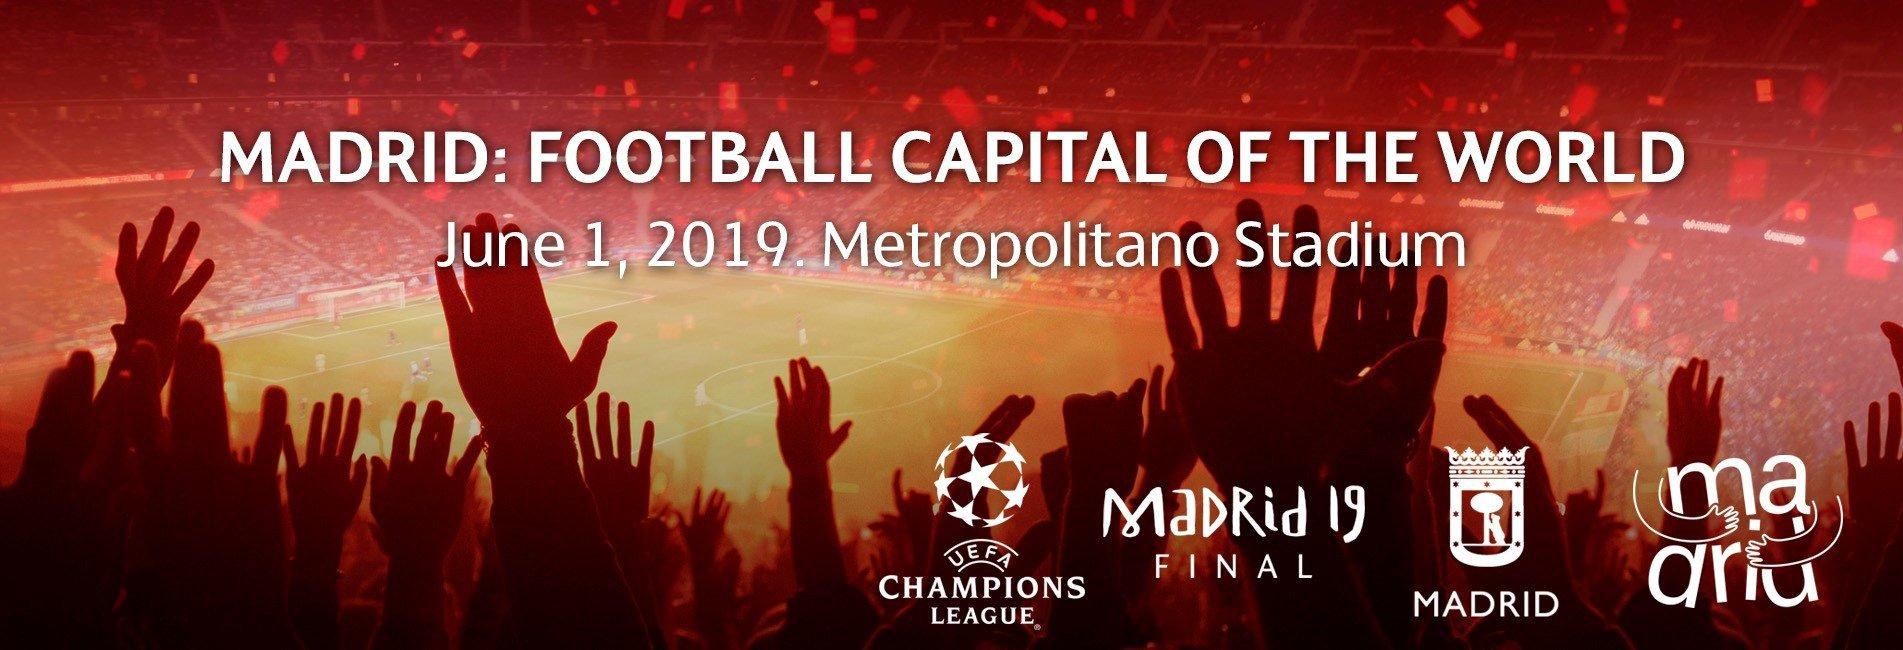 Madrid: Football capital of the world. UEFA Champions League Final